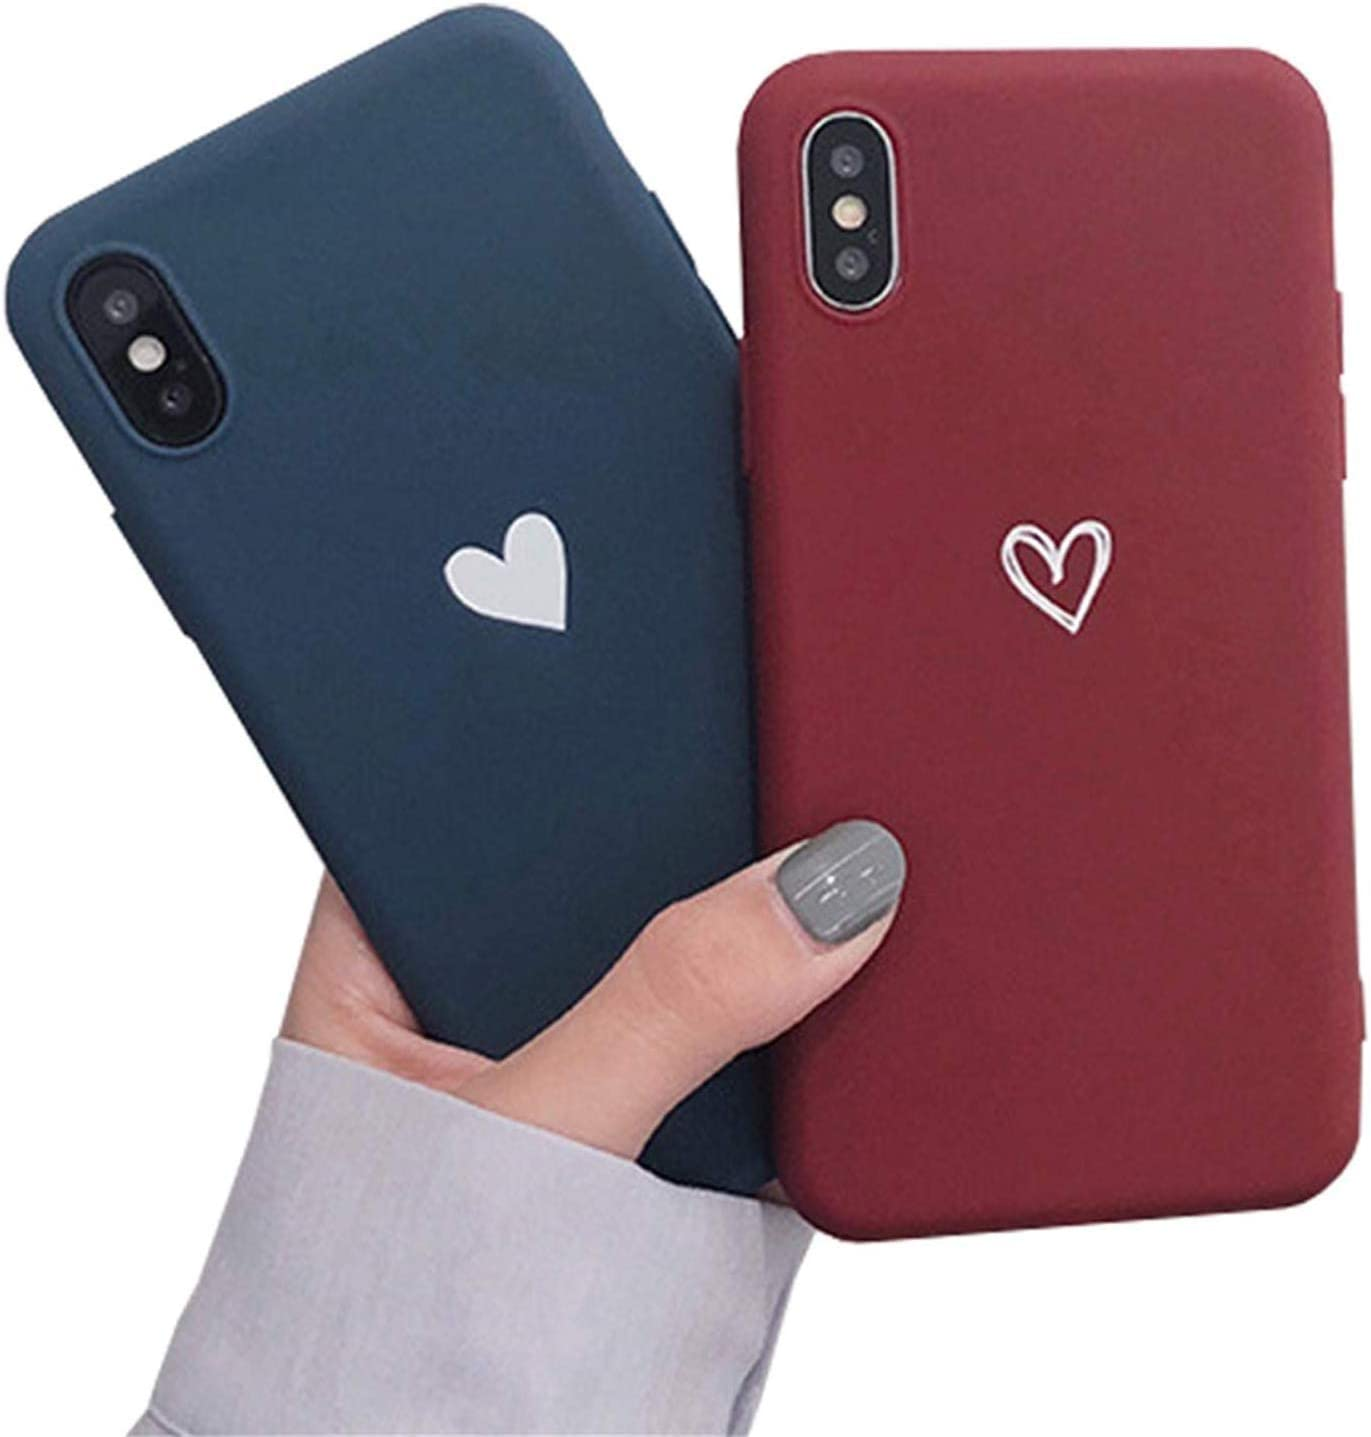 Blau Homikon Silikon H/ülle Kreative Paar Liebe Handyh/ülle Soft Flexibles Weich Ultra D/ünn Schlank Schutzh/ülle Sto/ßfest Case Back Cover Bumper Tasche Schale Kompatibel mit iPhone 6 Plus//6S Plus